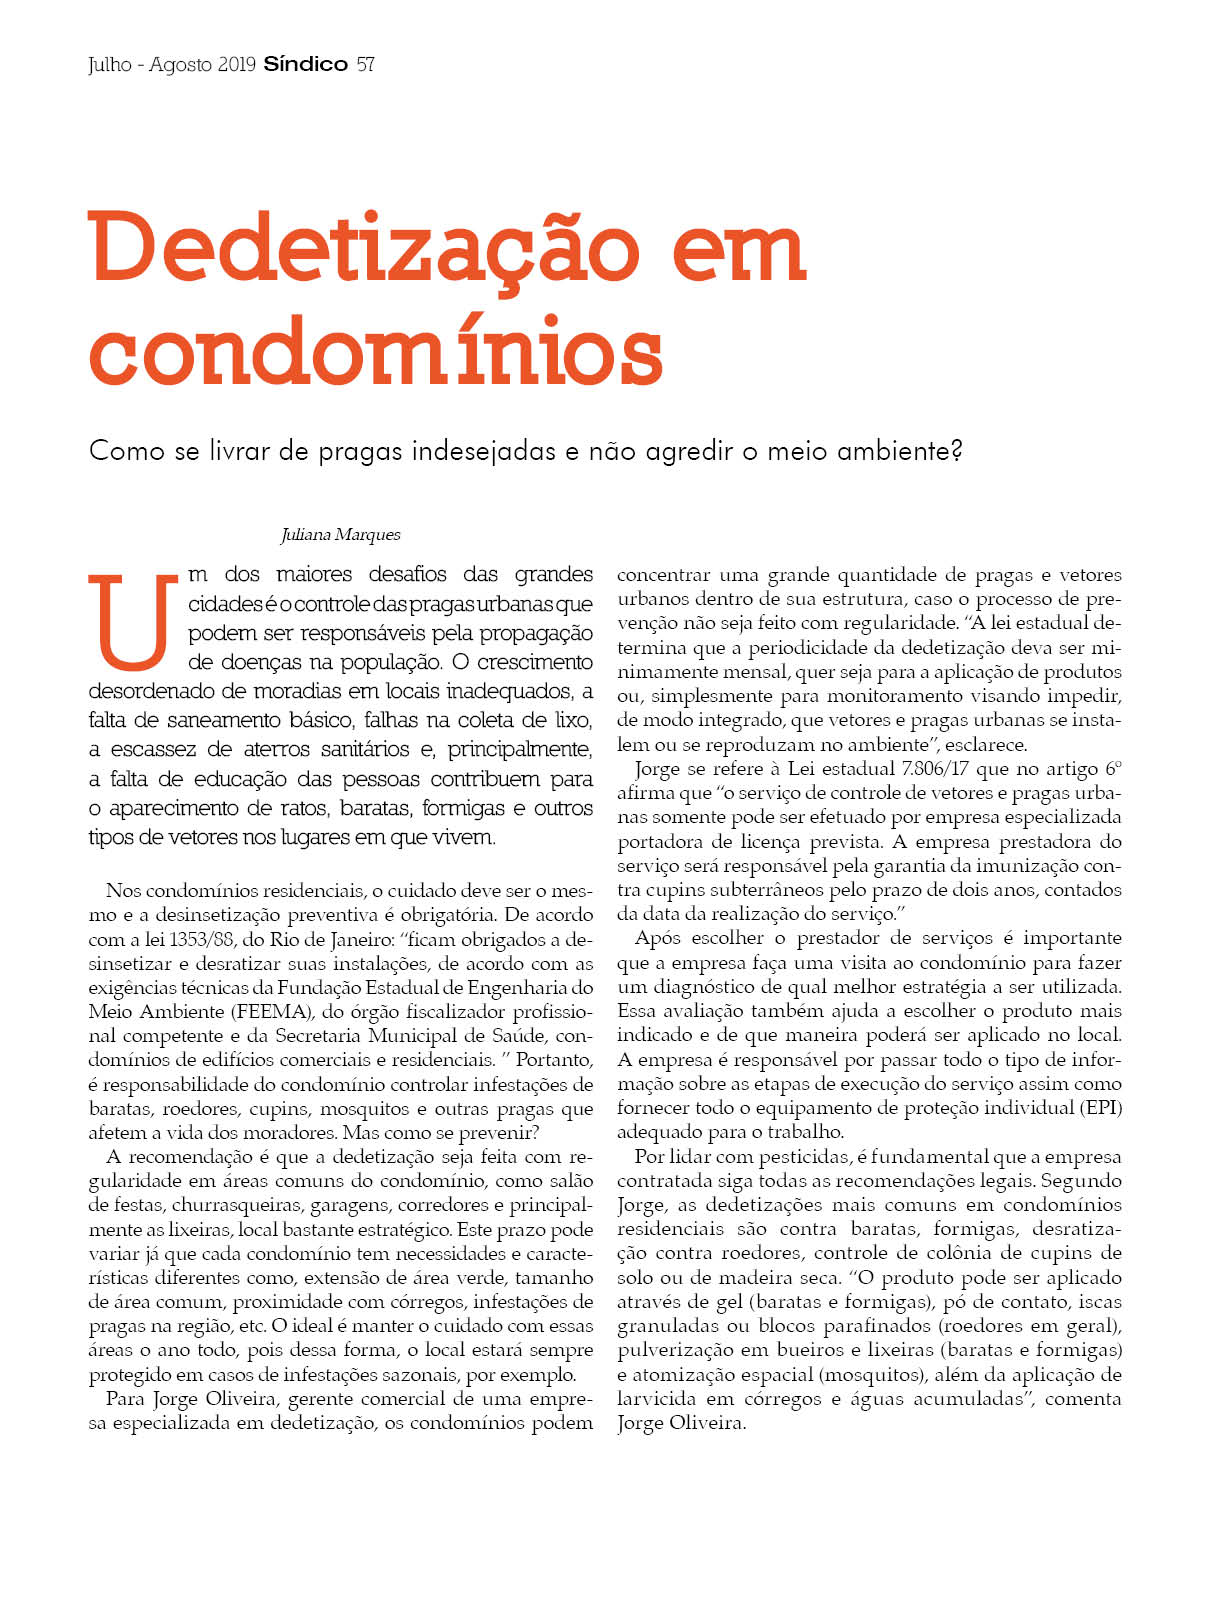 Revista Síndico_ed 24555